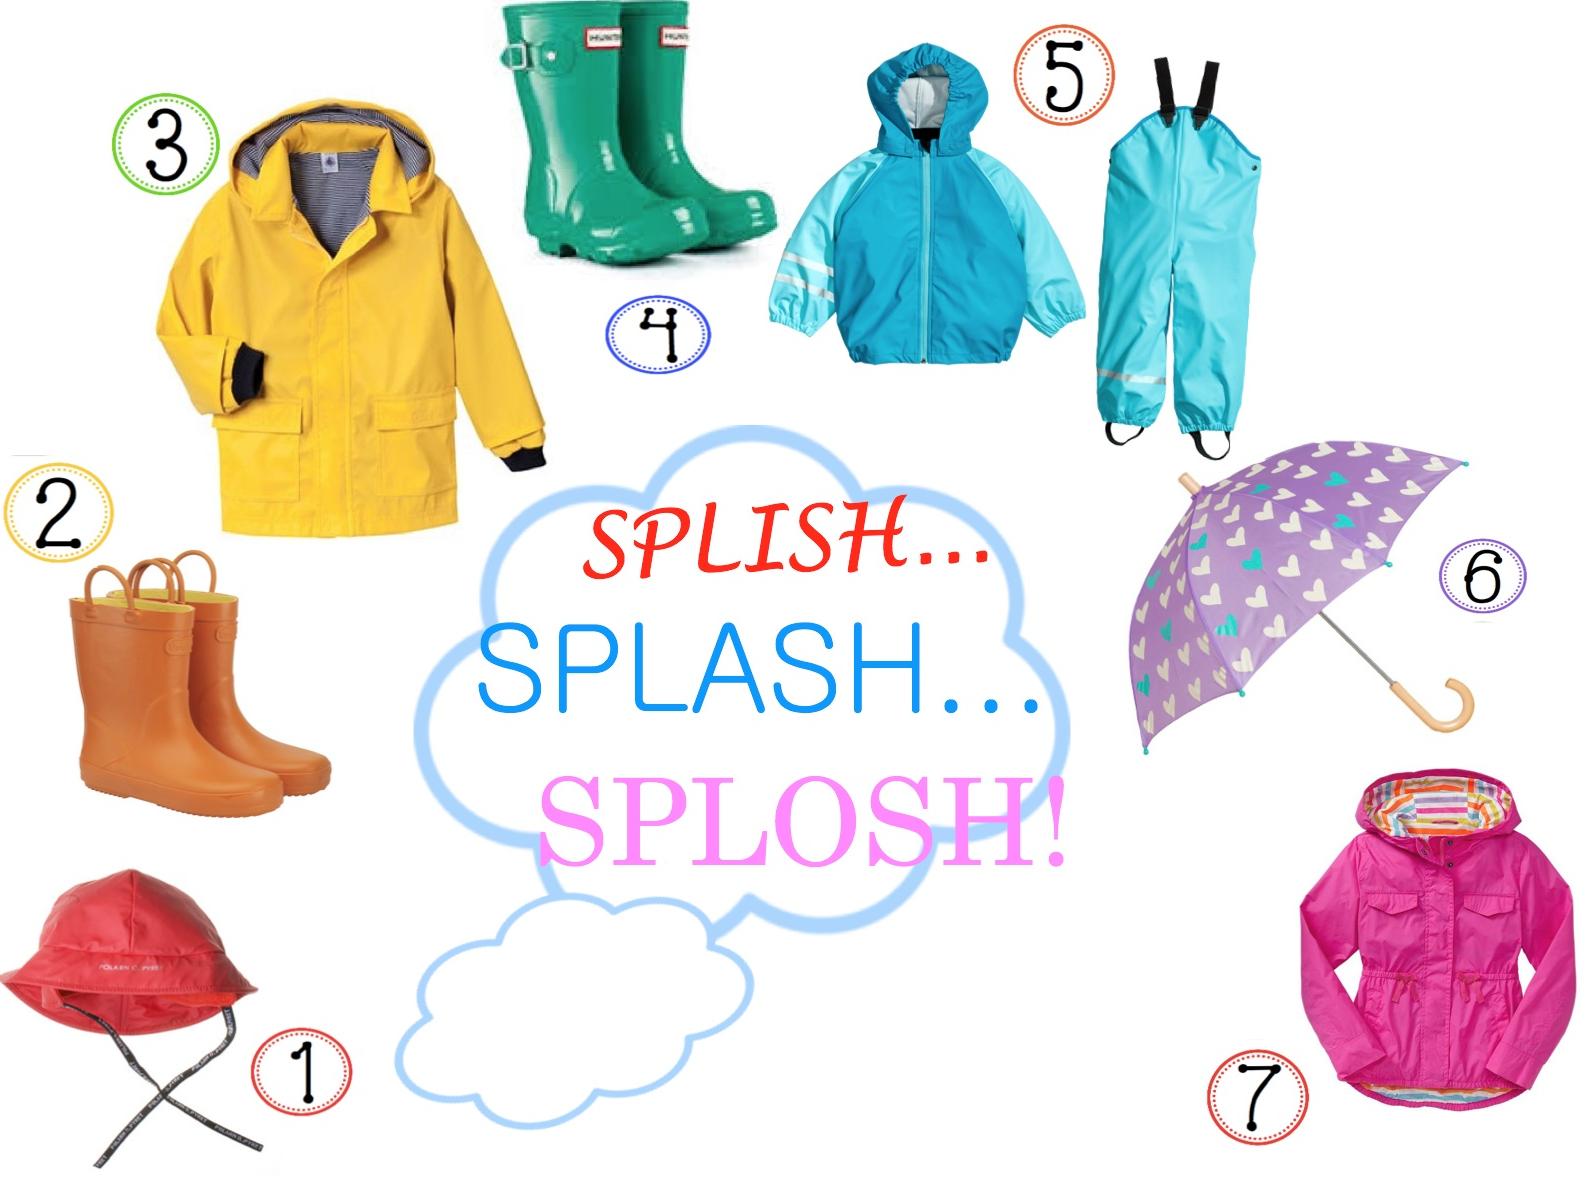 Season clipart wet weather #5